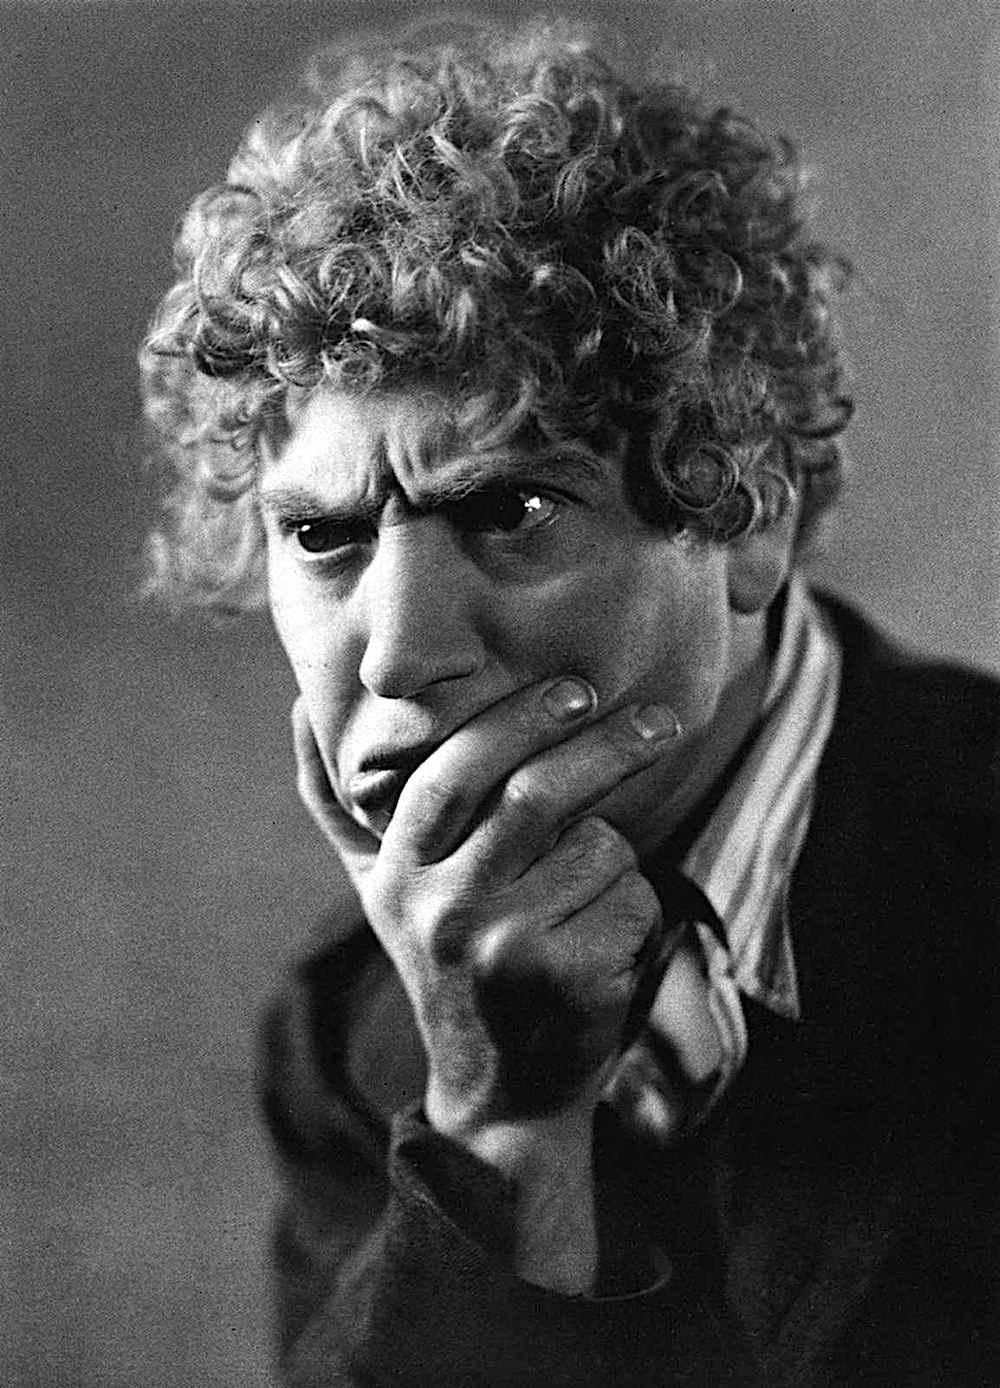 a Harpo Marx portrait photograph, the thinker